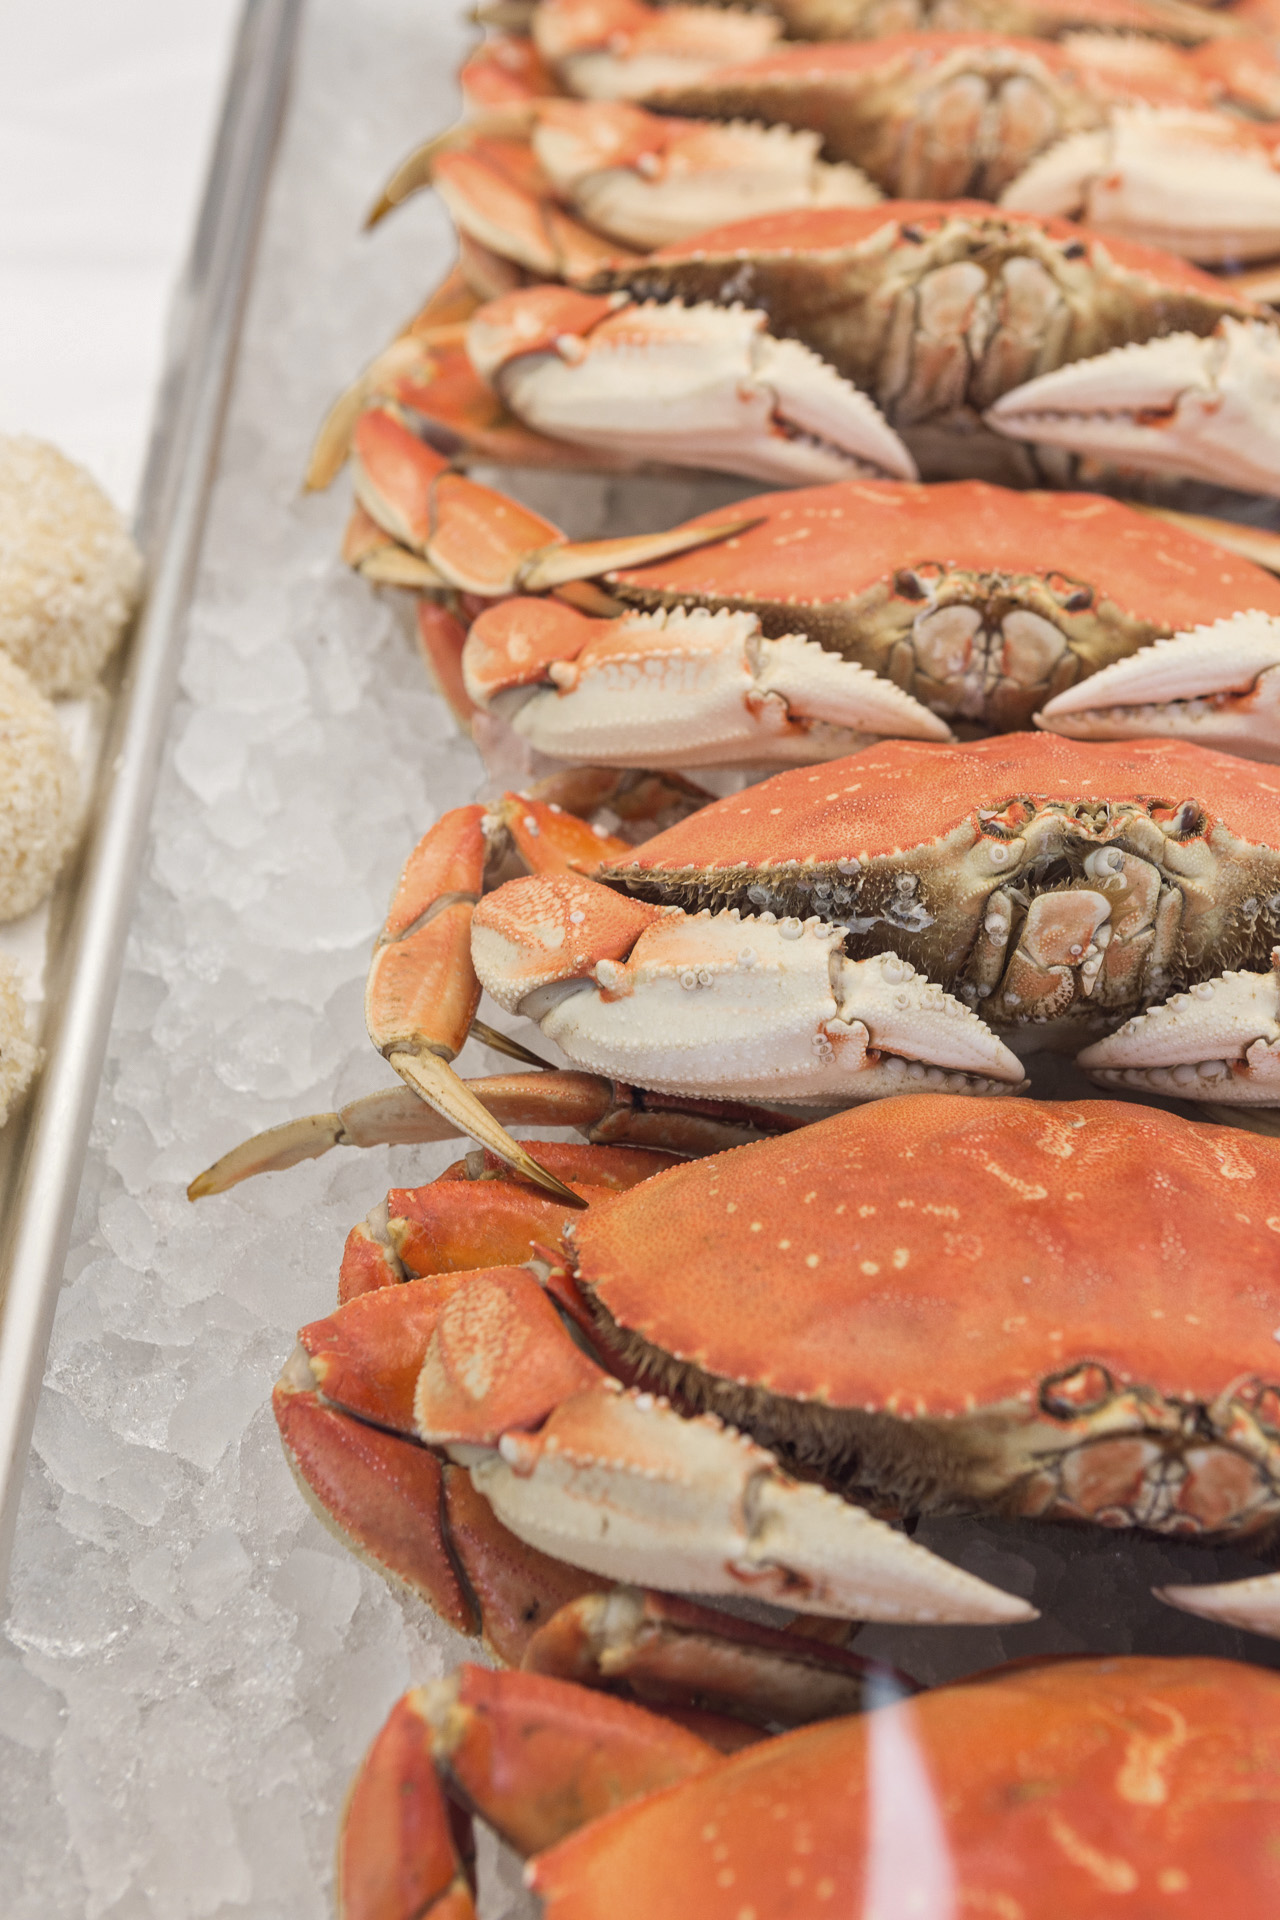 EA - crabs up close - lou daprile.jpg